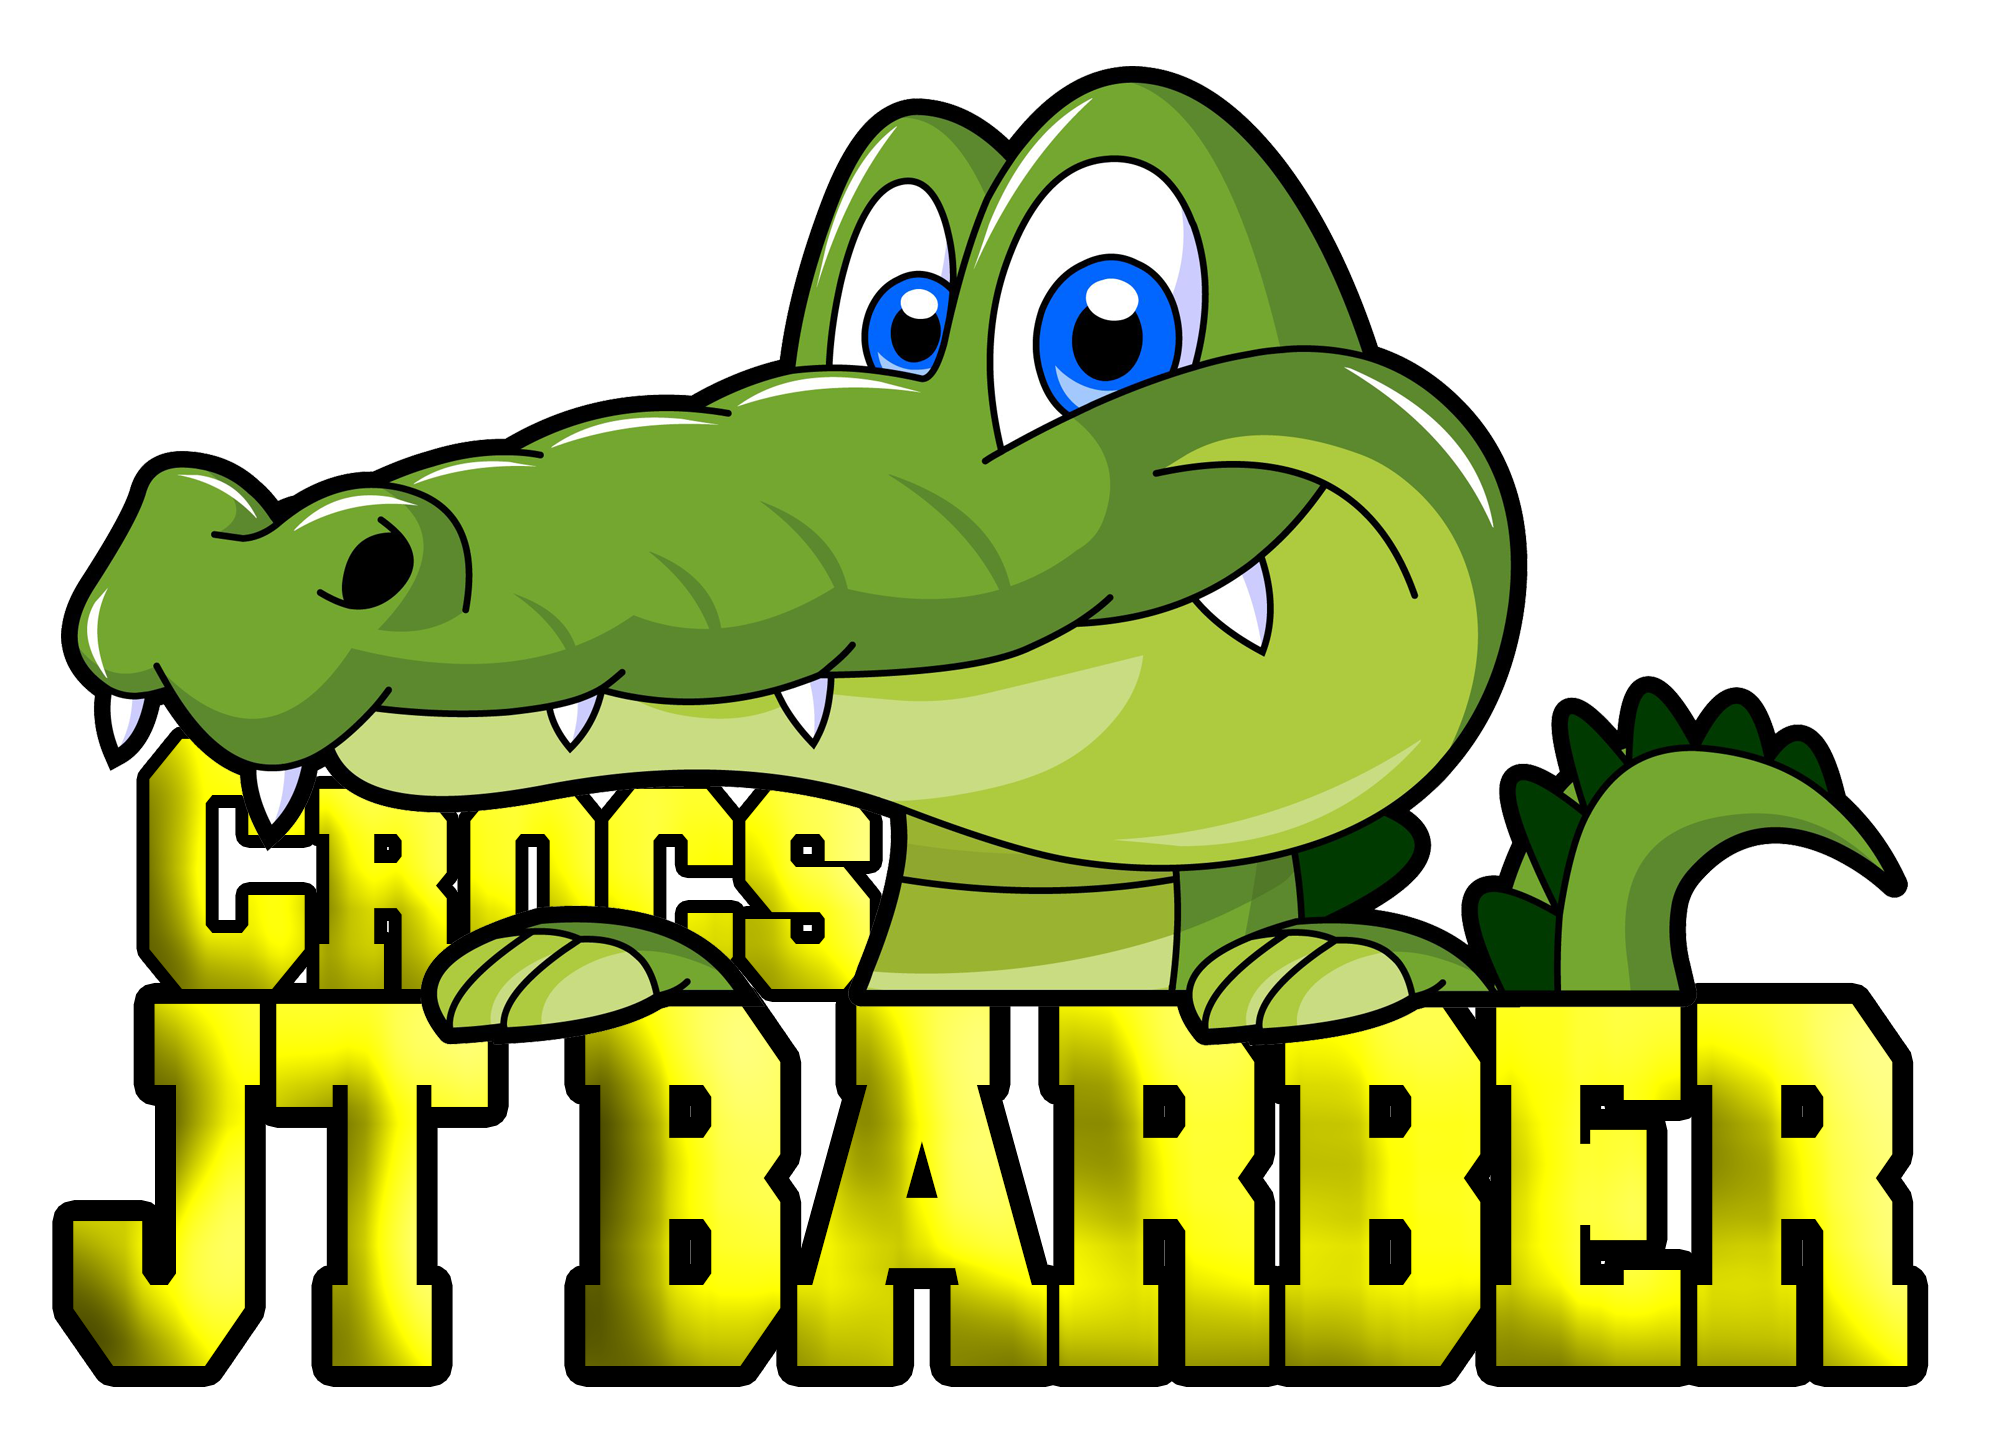 Elementary school teacher clipart clip art J.T. Barber Elementary / Homepage clip art